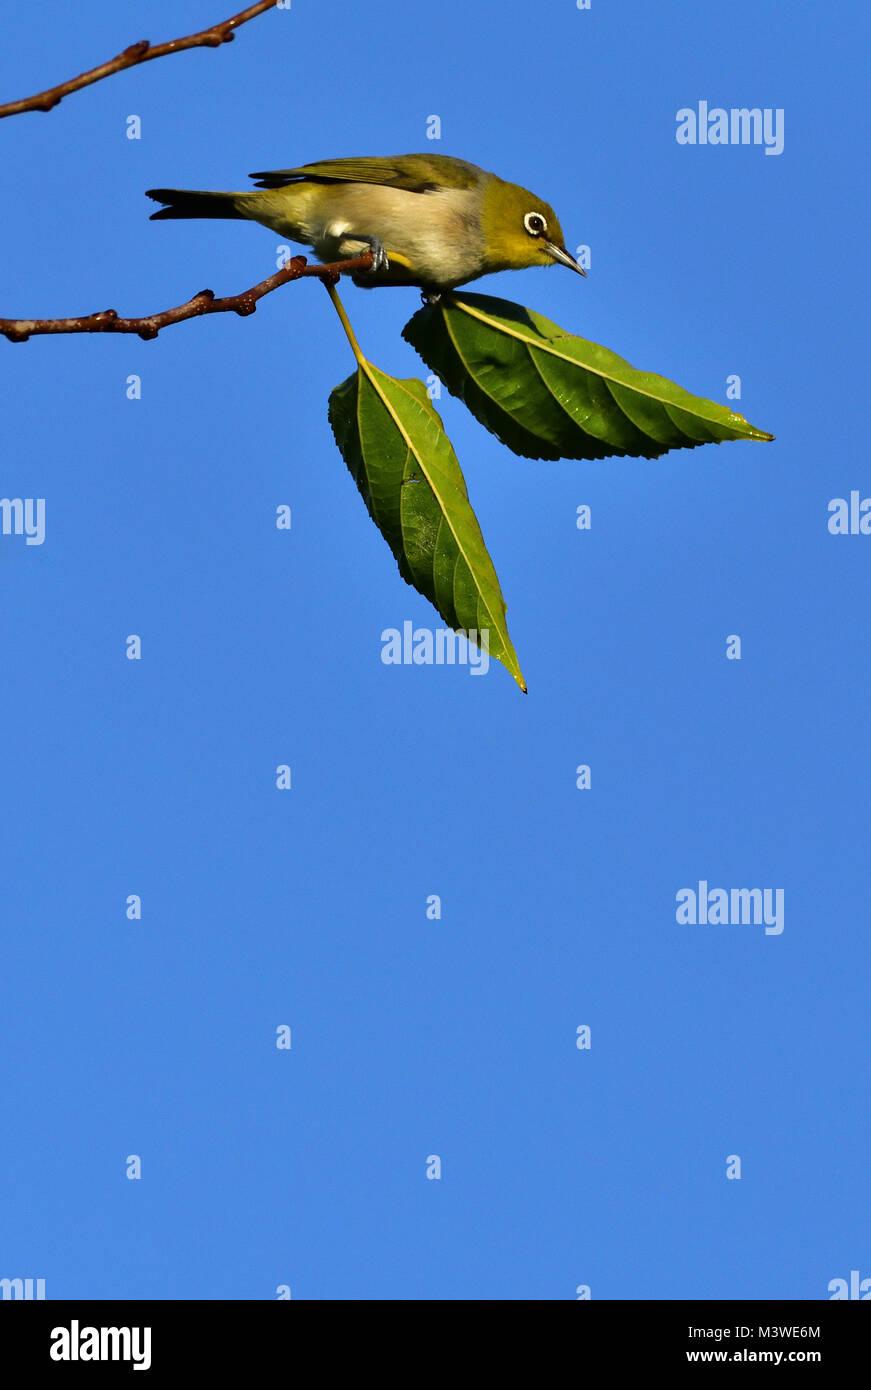 An Australian Silvereye resting on a Tree branch - Stock Image